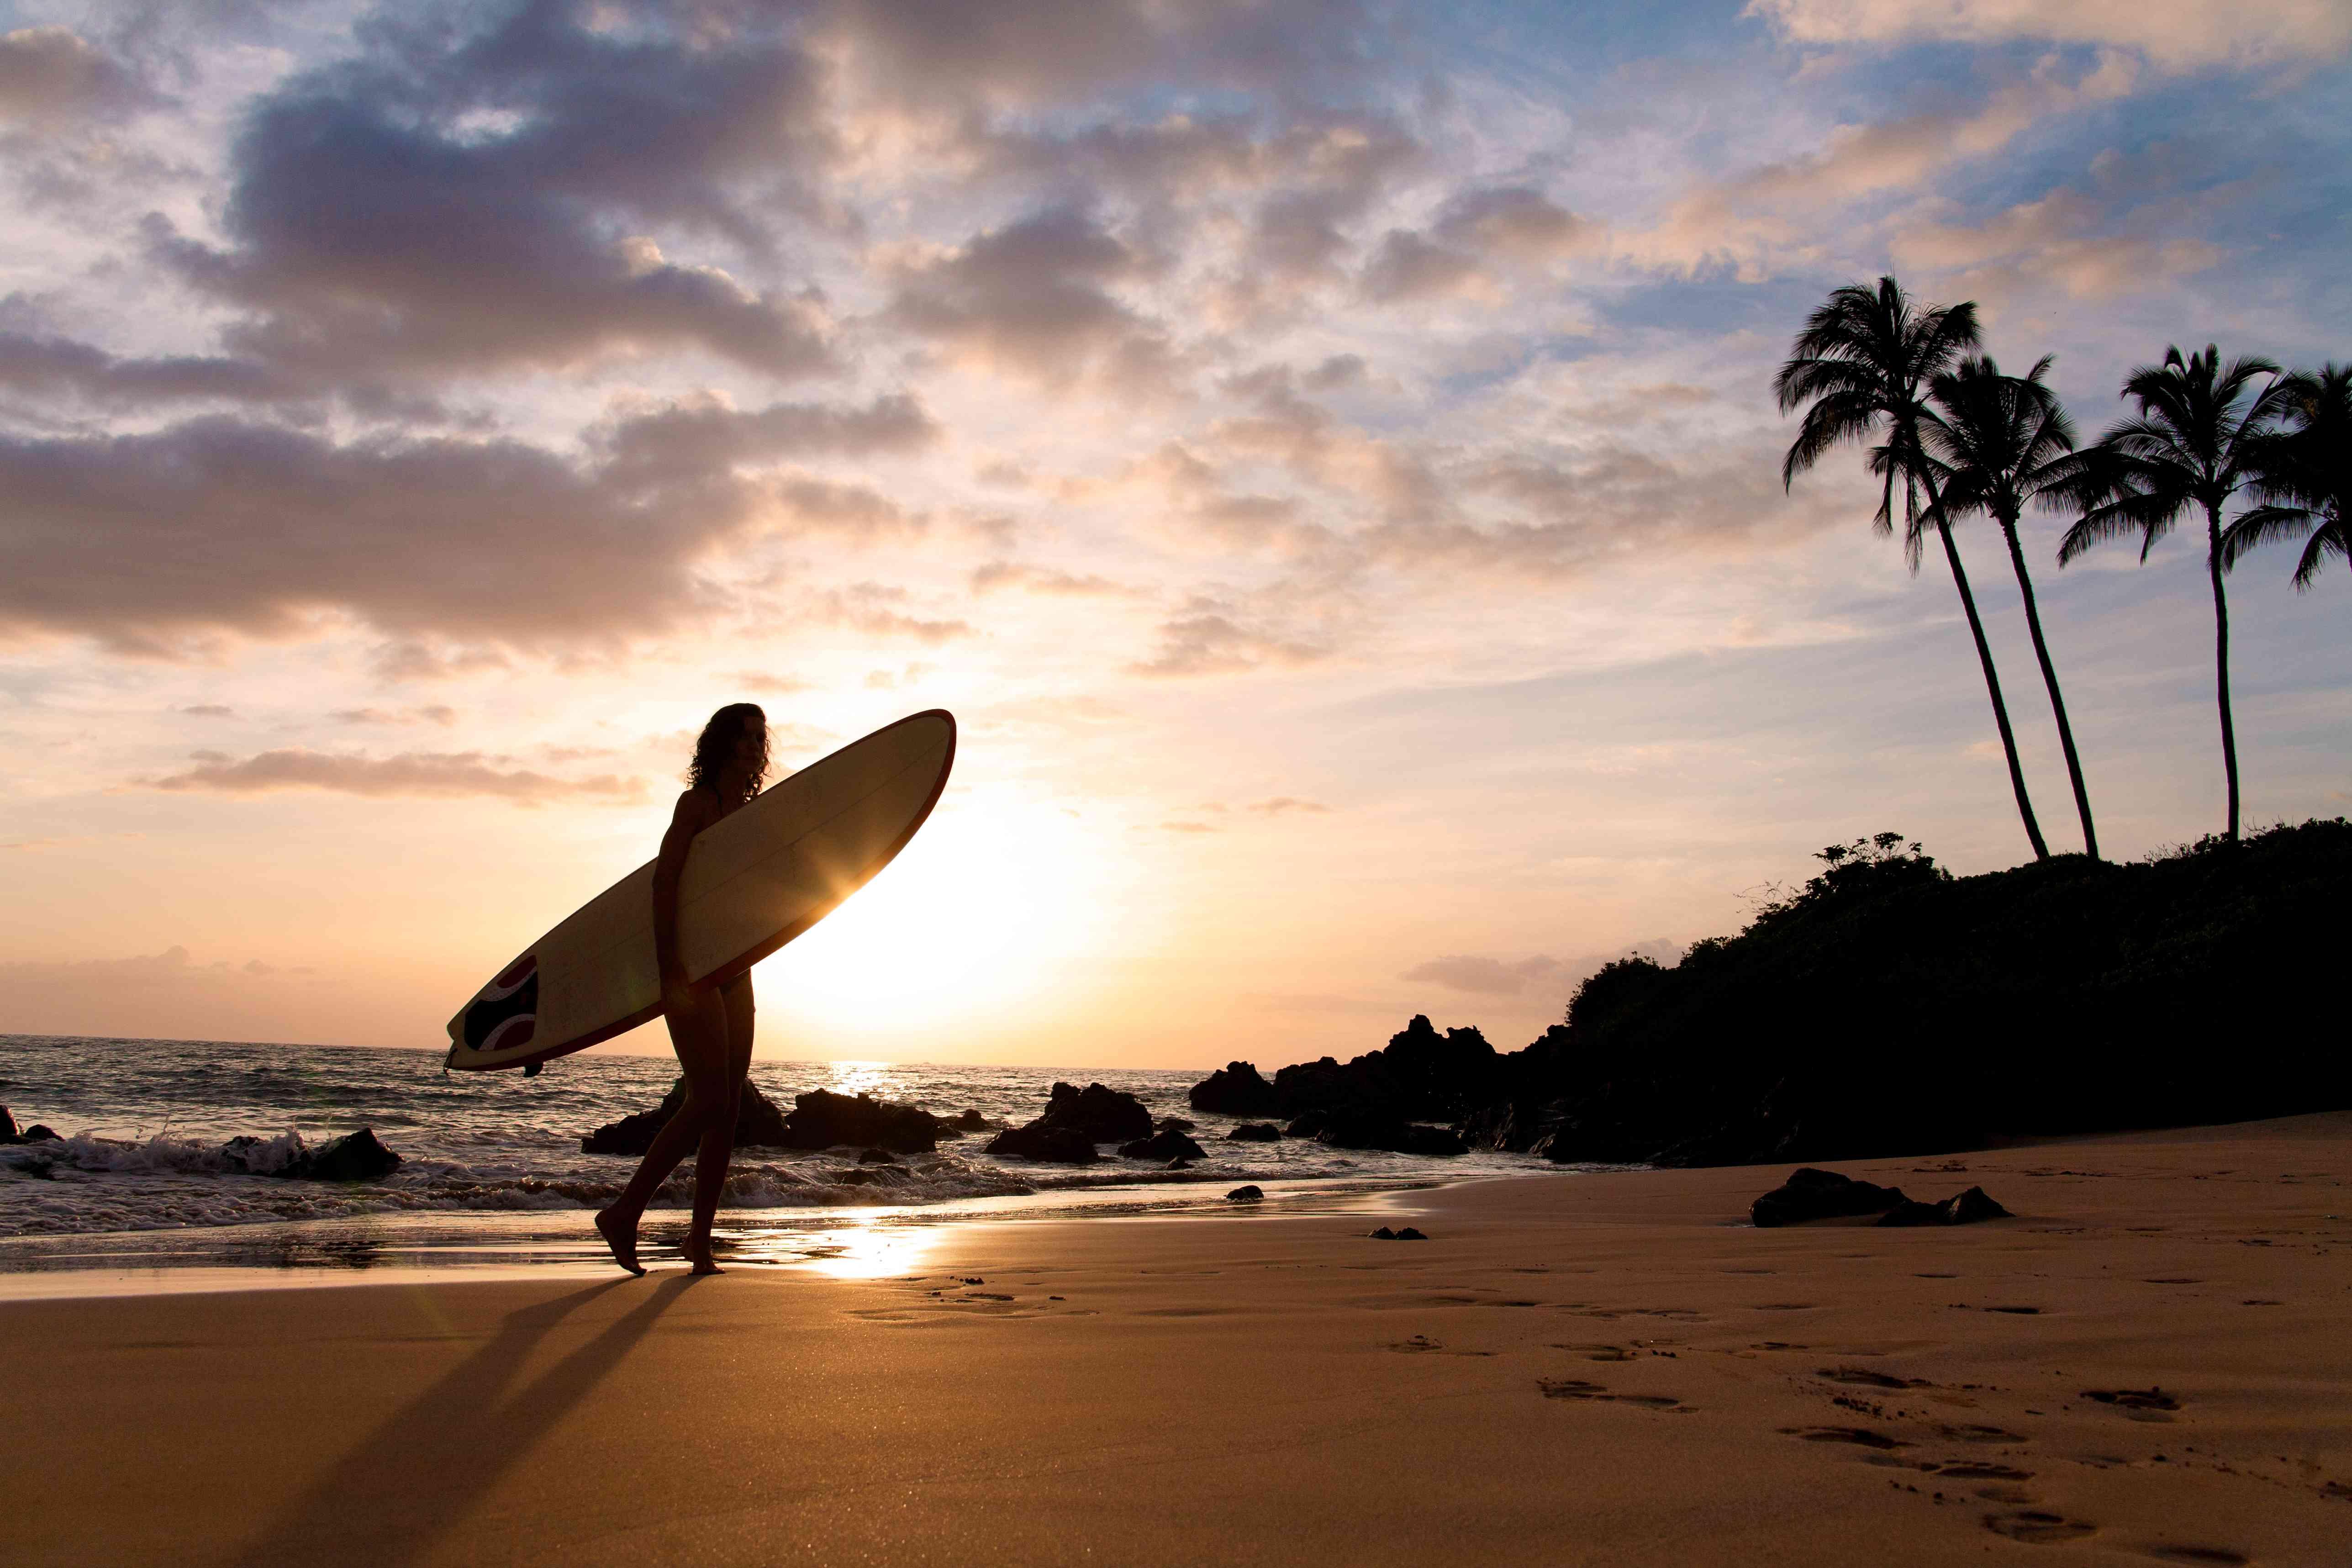 Surfer at sunet walkinh on sand